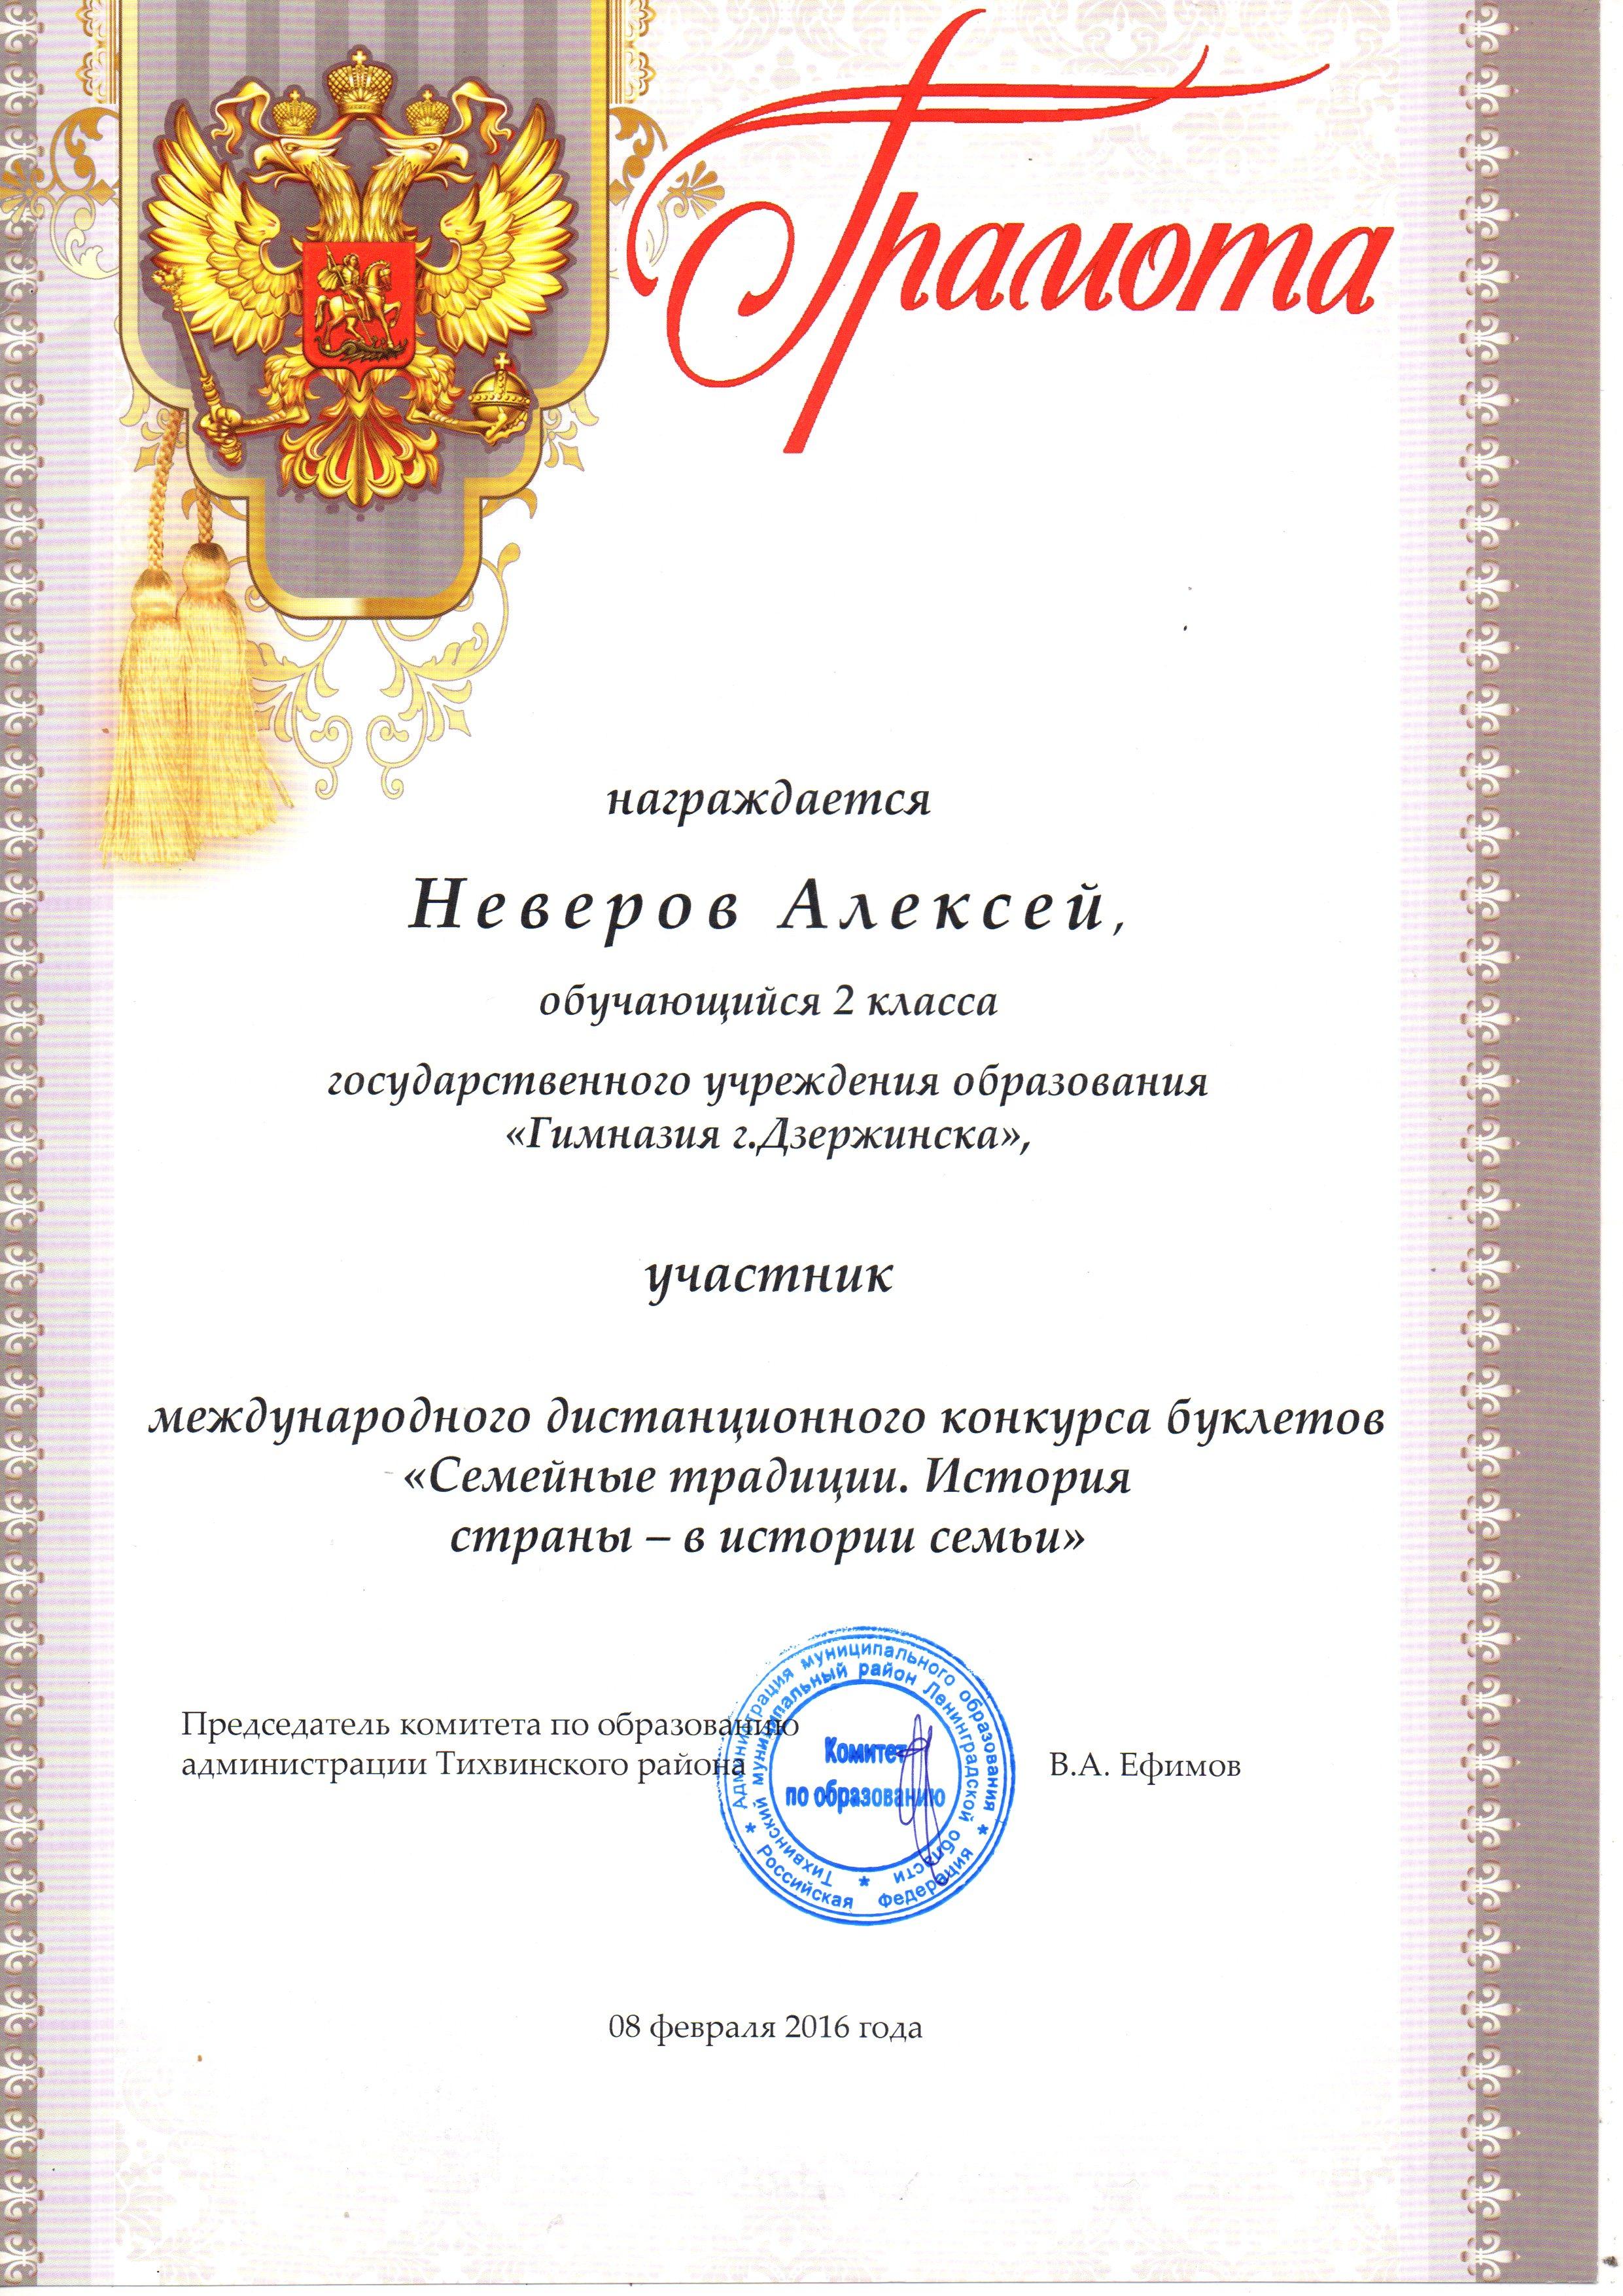 img253